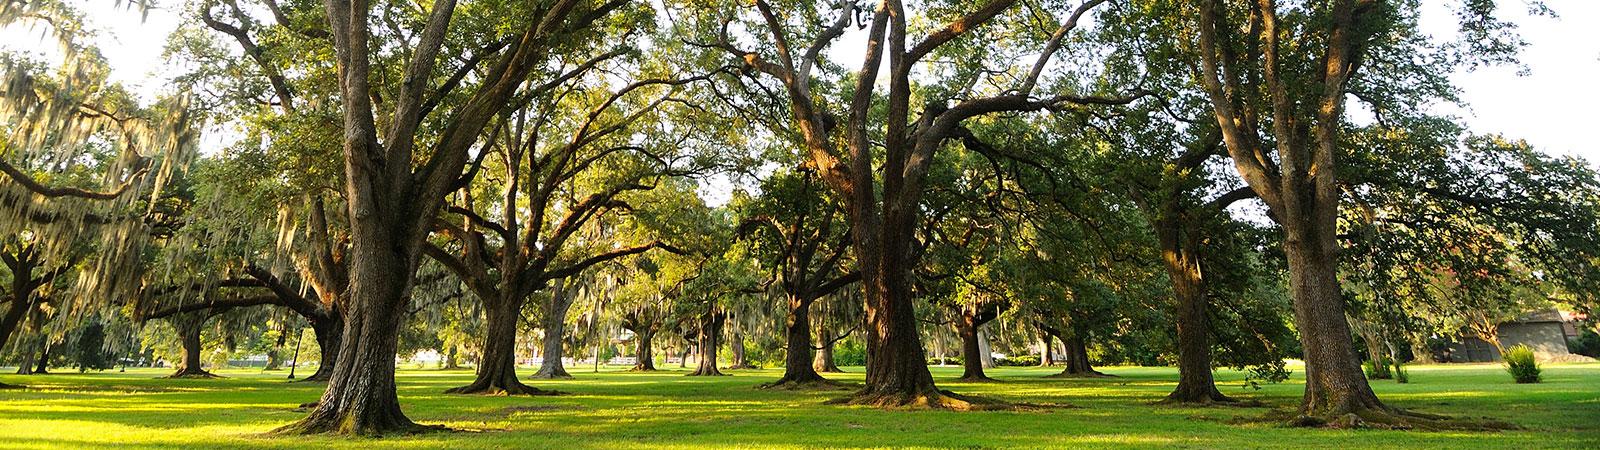 slider-trees